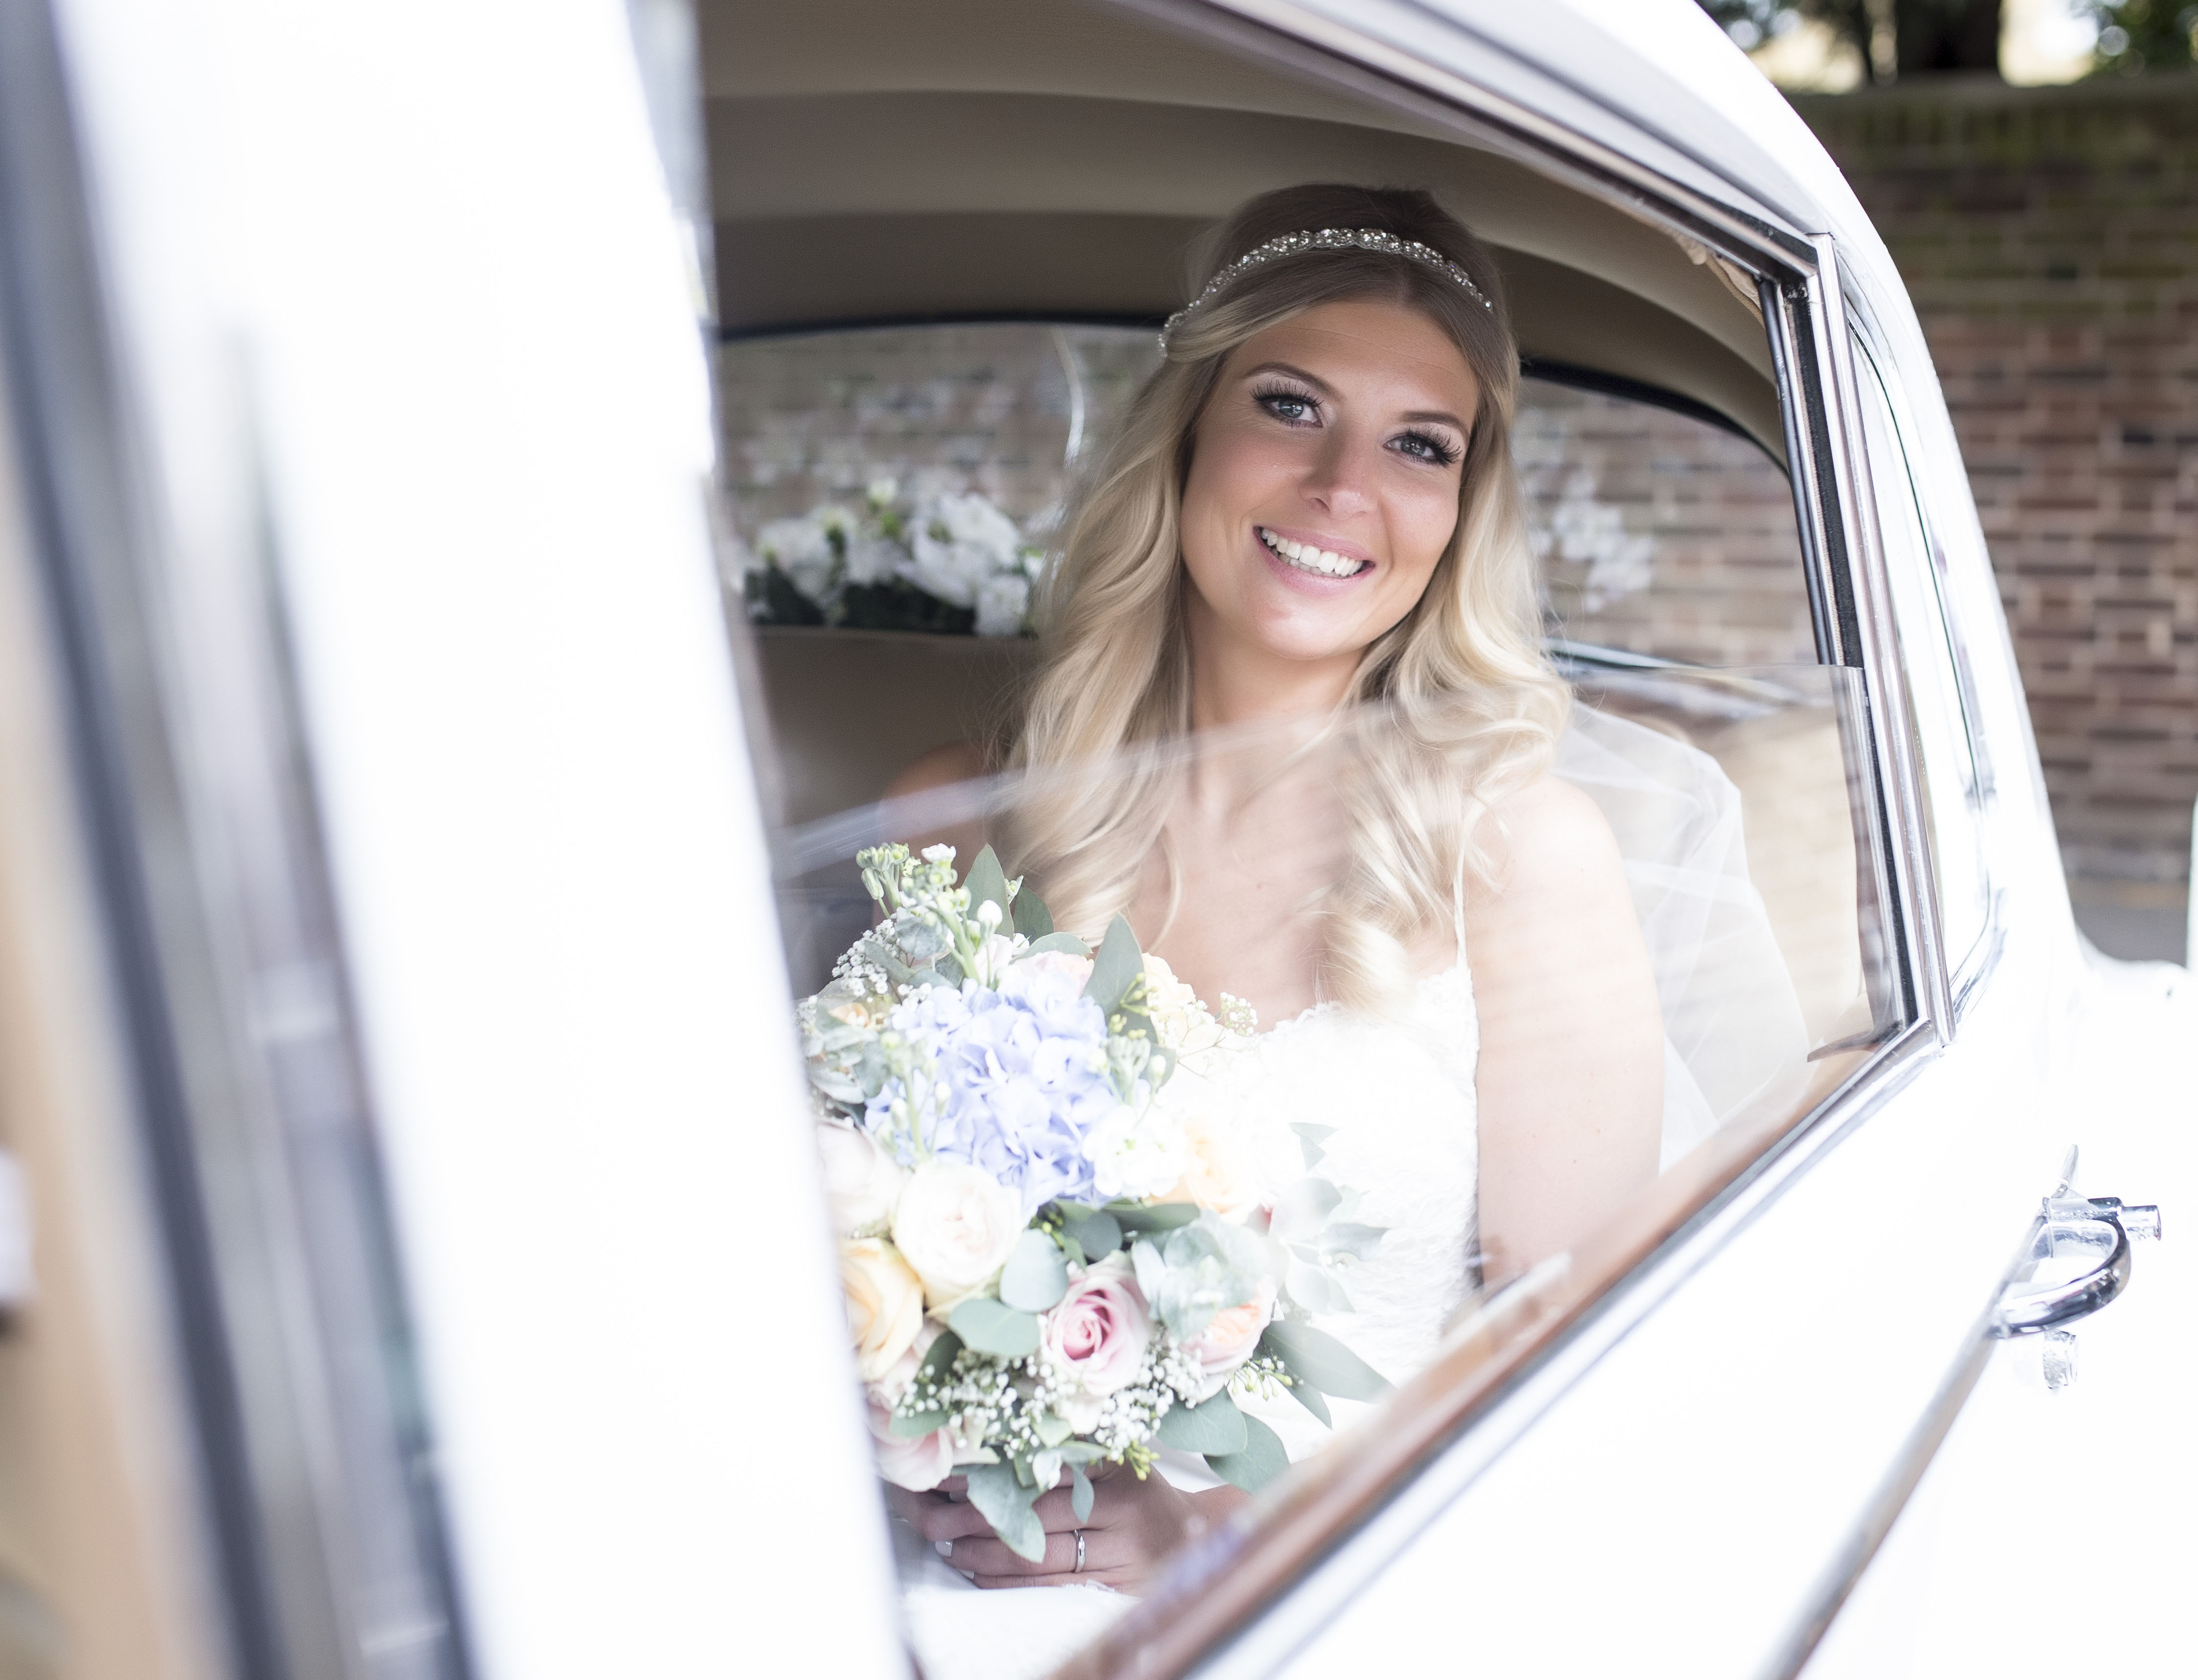 elizabethgphotography_fineart_wedding_photographer_hertfordshire_stmichaelsmanor_stalbans_lucie_jack